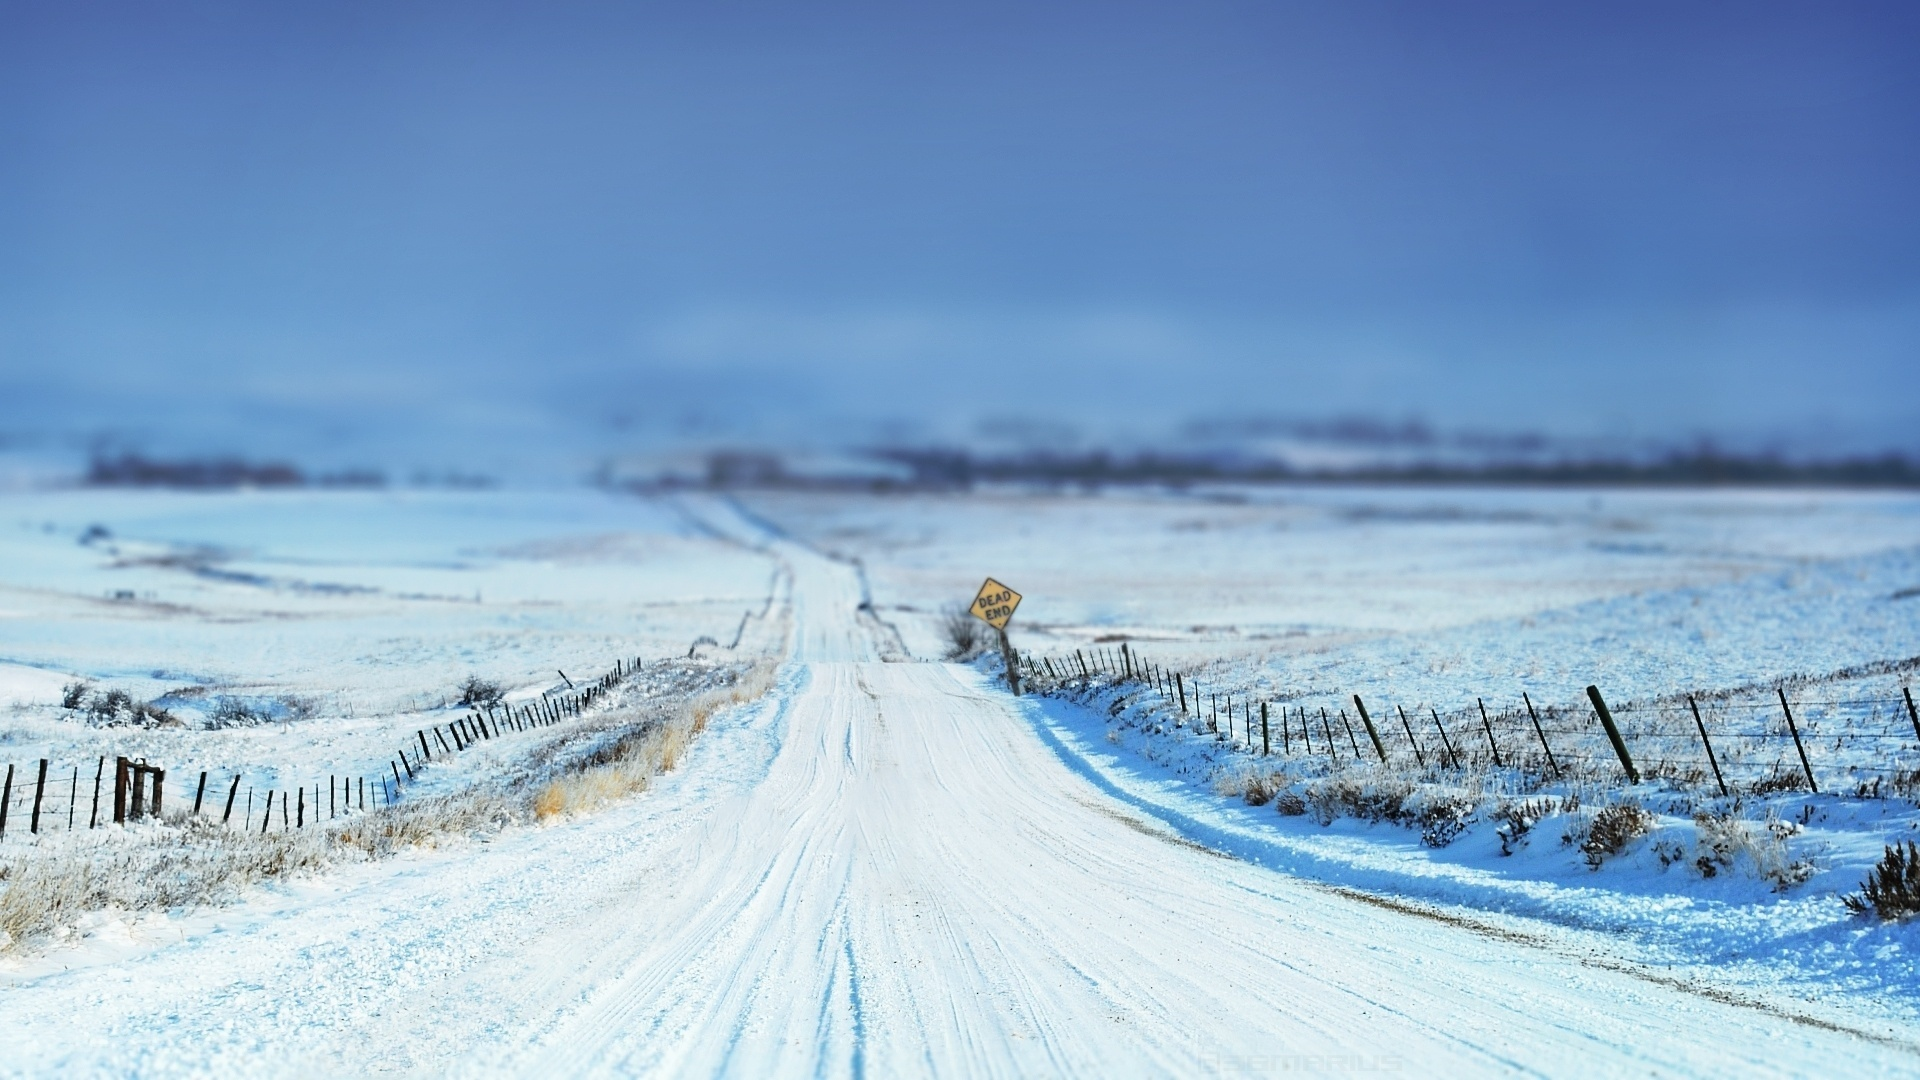 Wallpaper Winter Road 1920x1080 Full HD 2K Picture Image